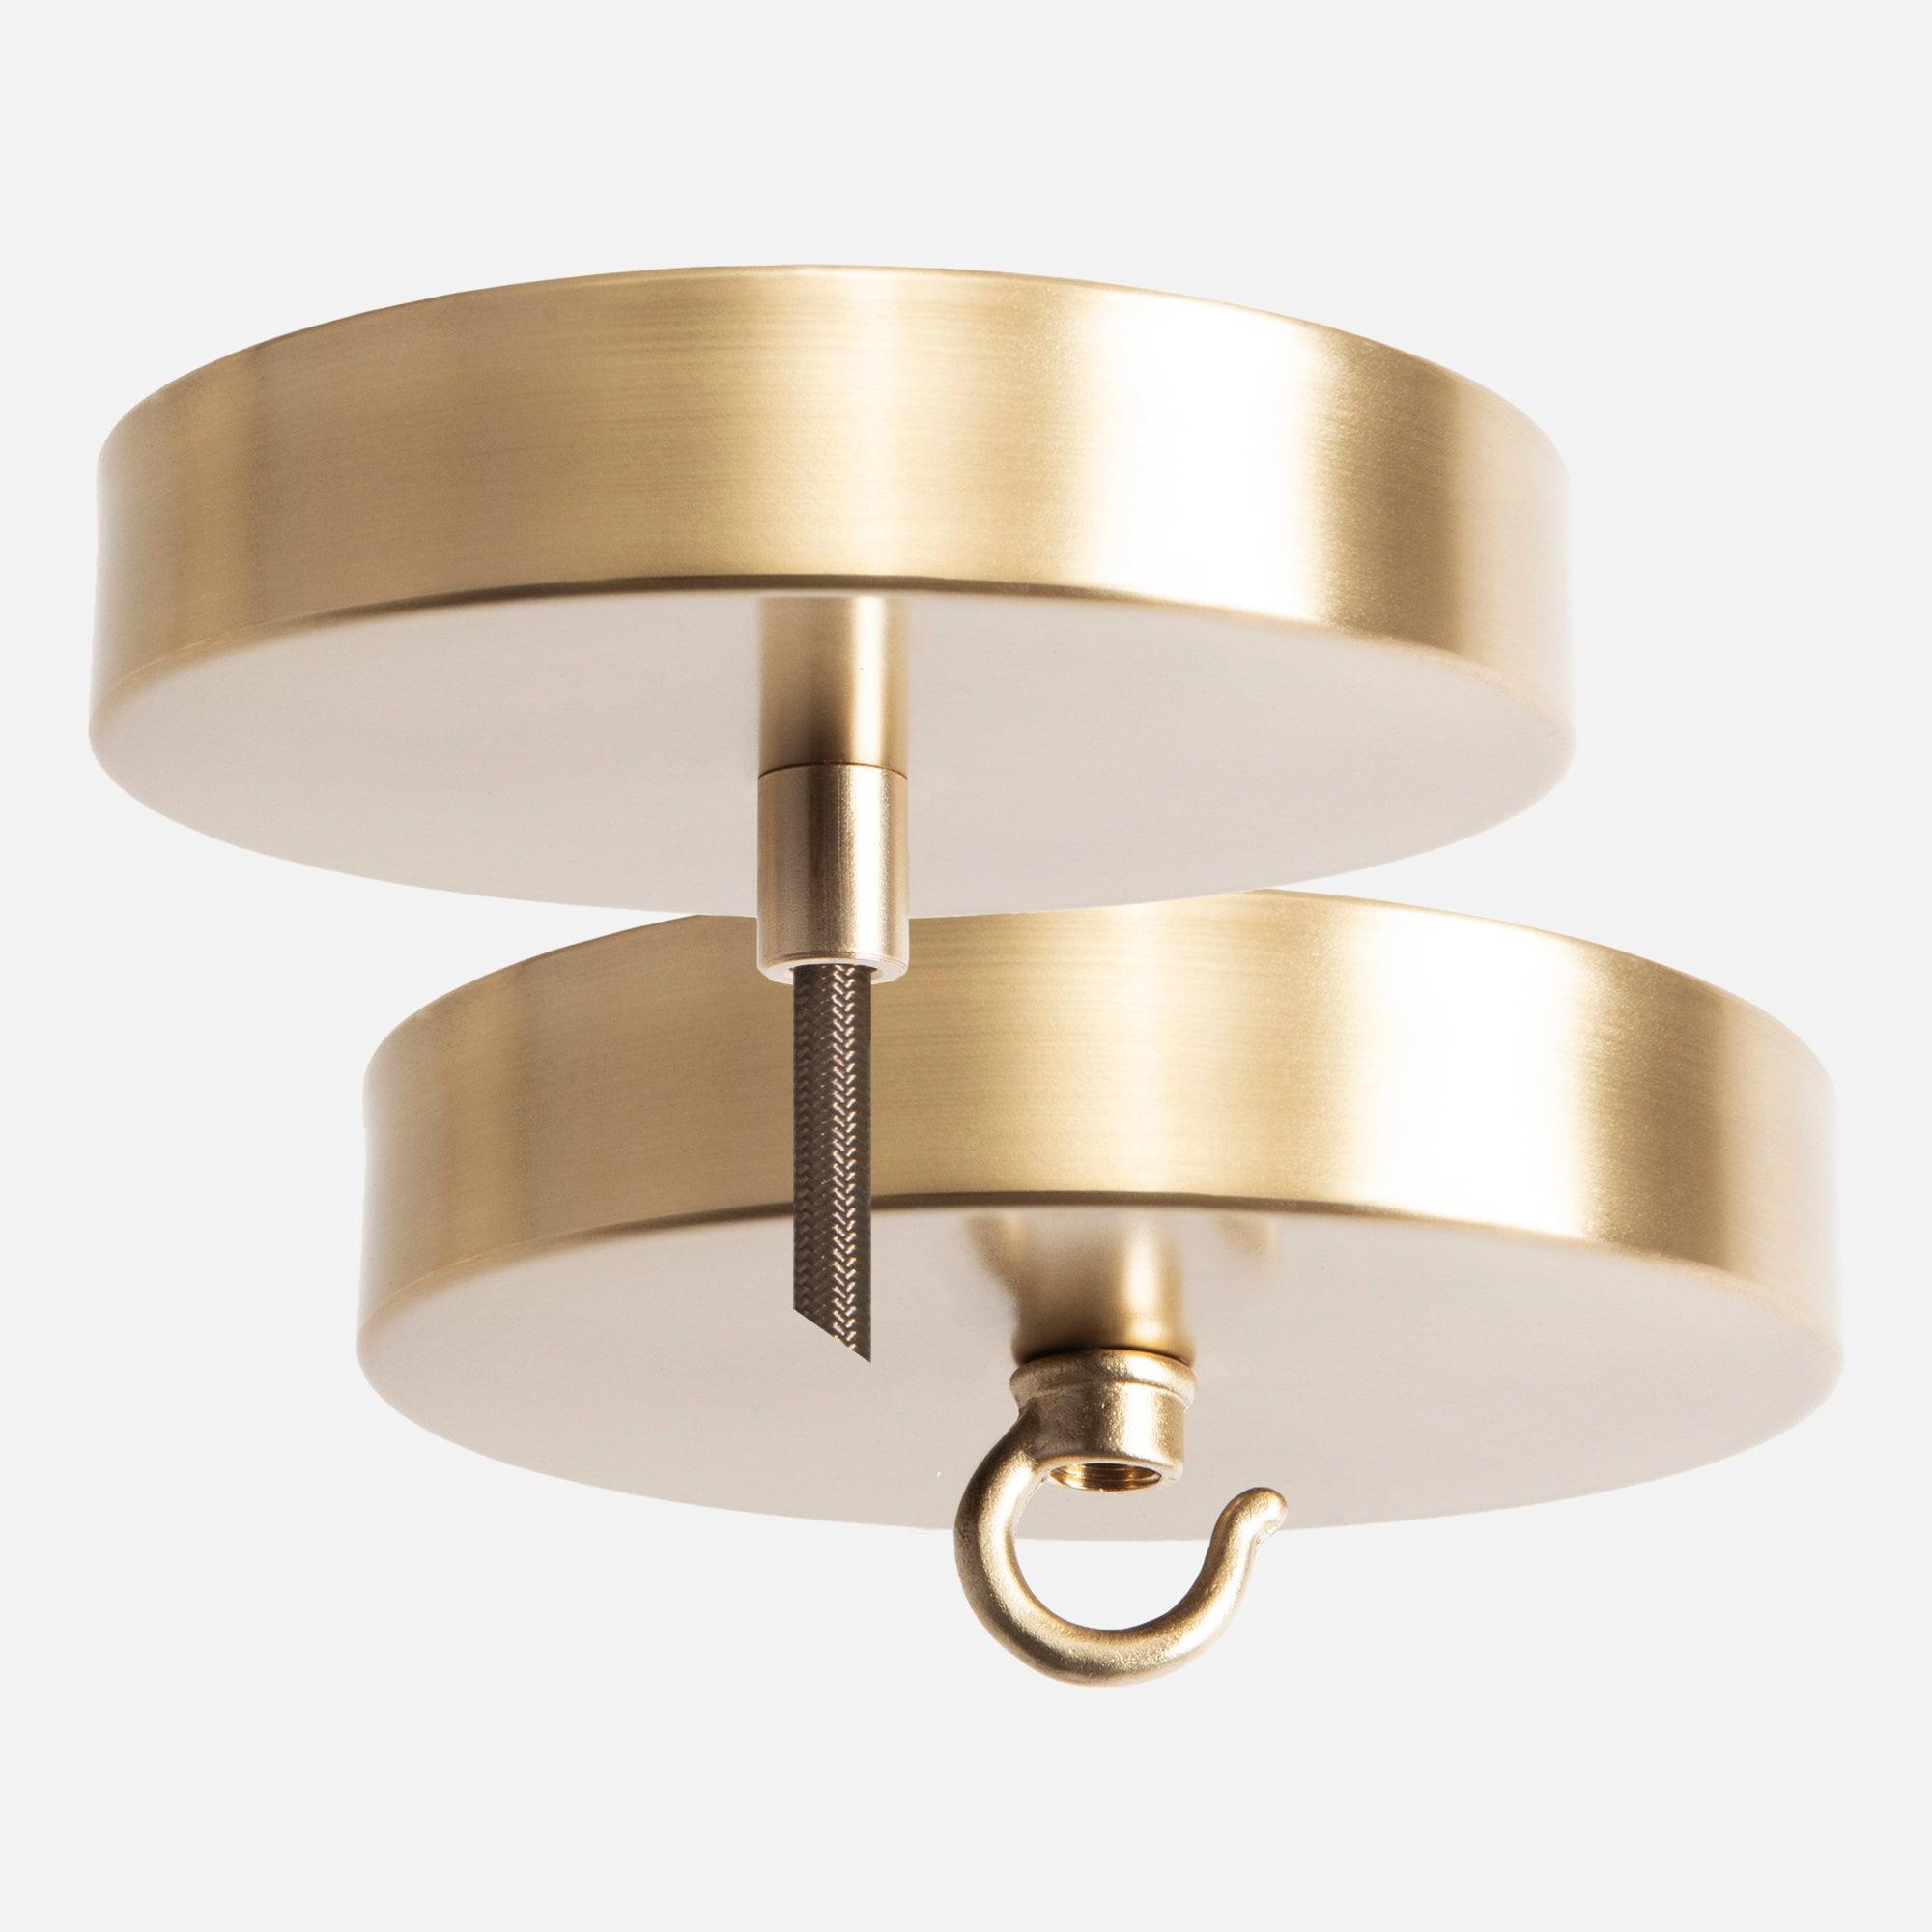 Brass Ceiling Canopy Kit Pendant Light Canopy Kit Pendant